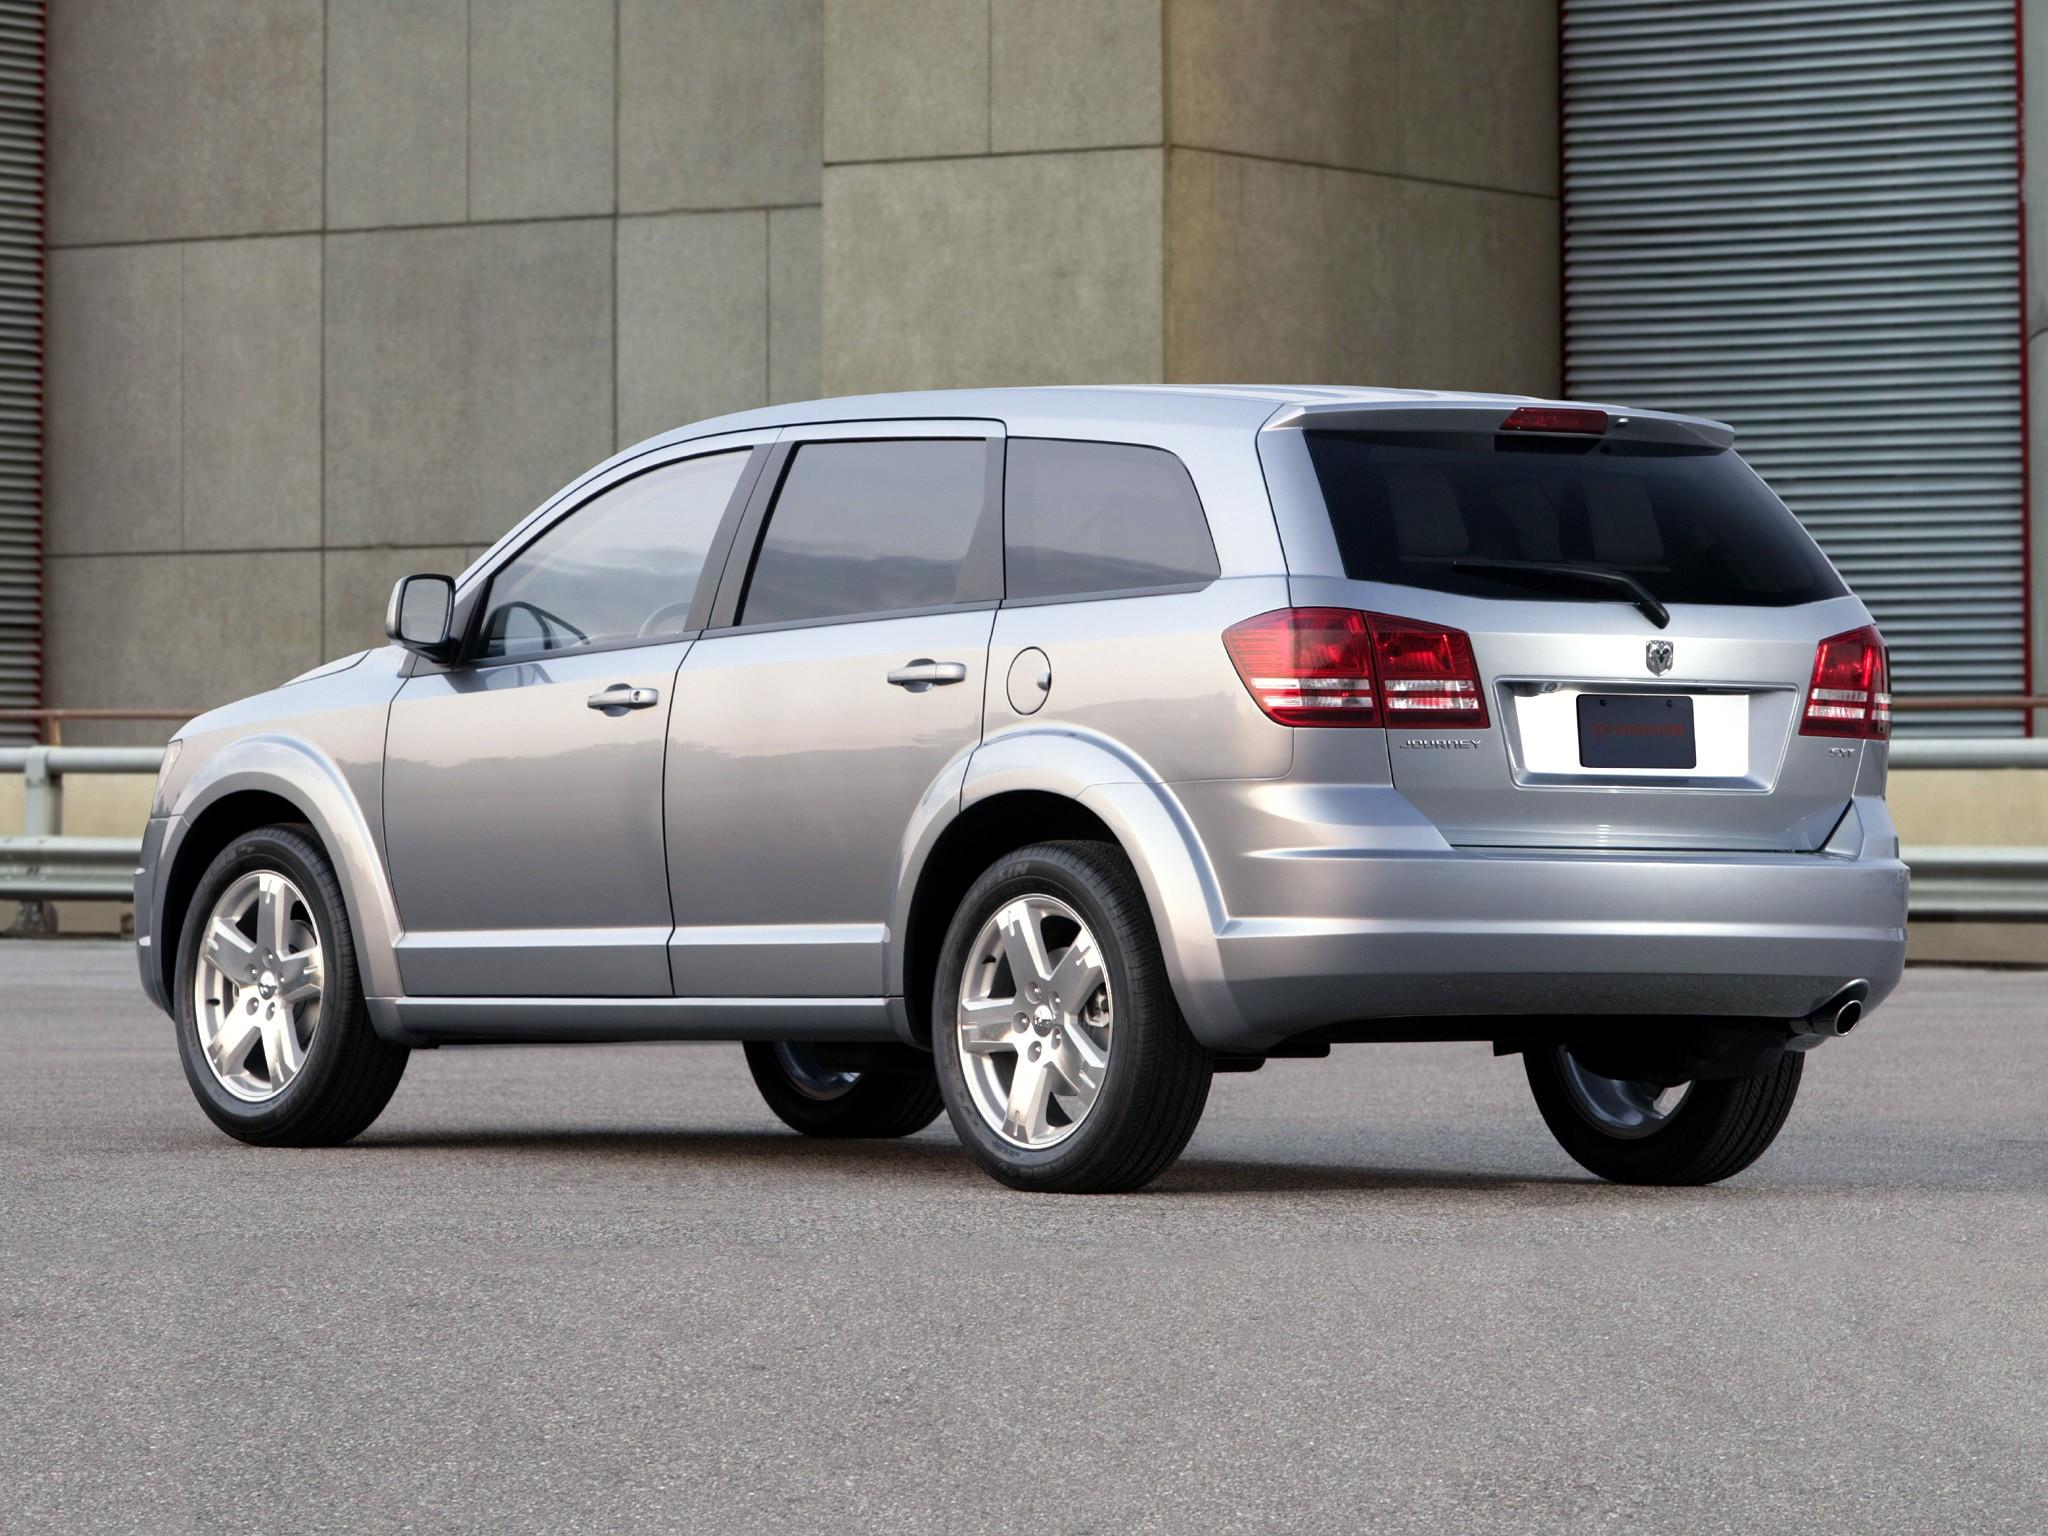 Dodge Journey - 2008  2009  2010  2011